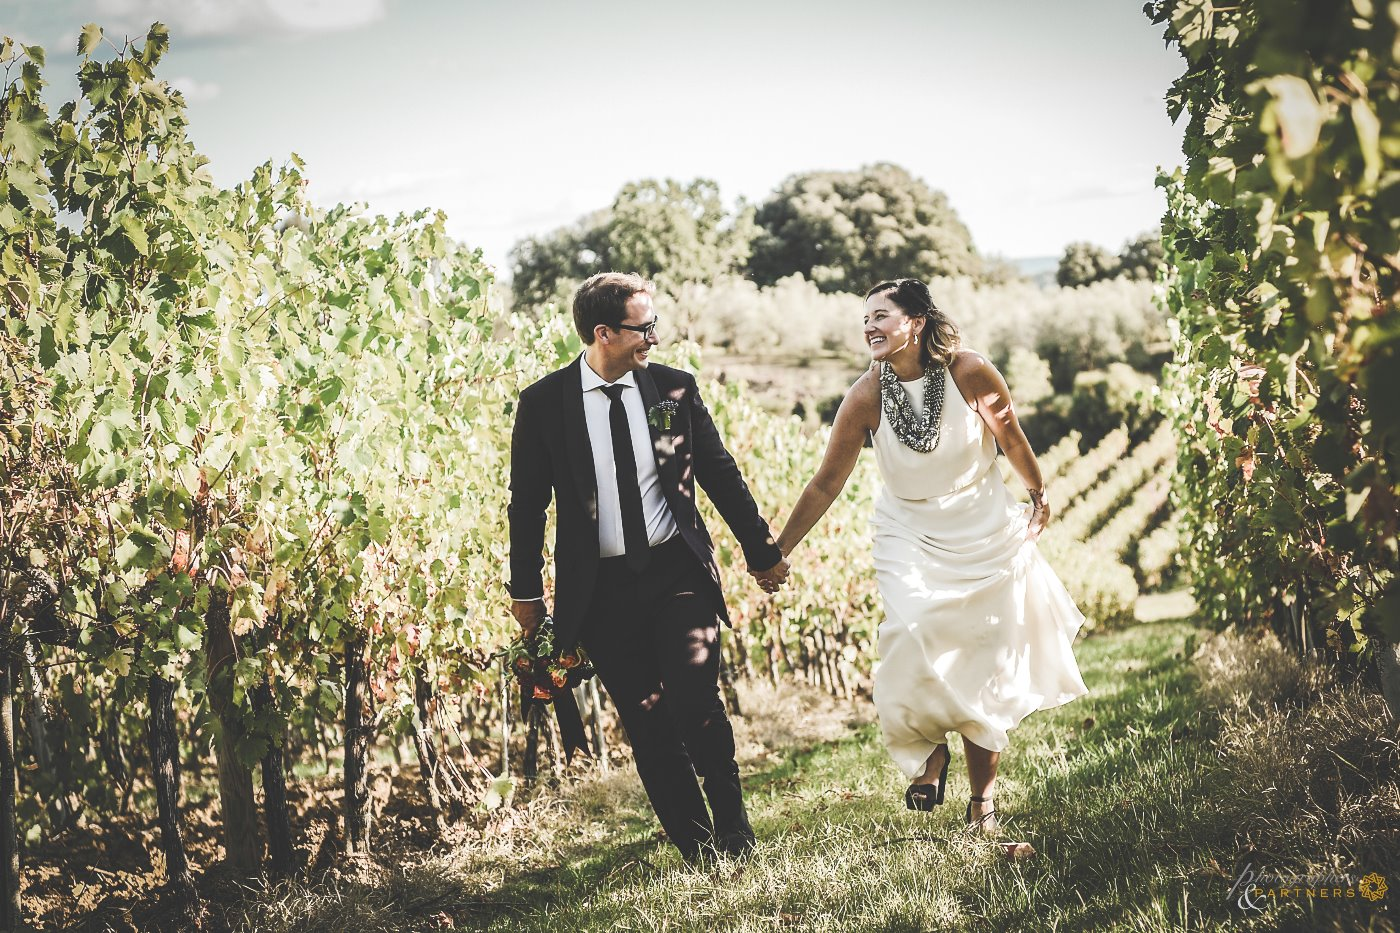 photography_marriage_volterra_20.jpg